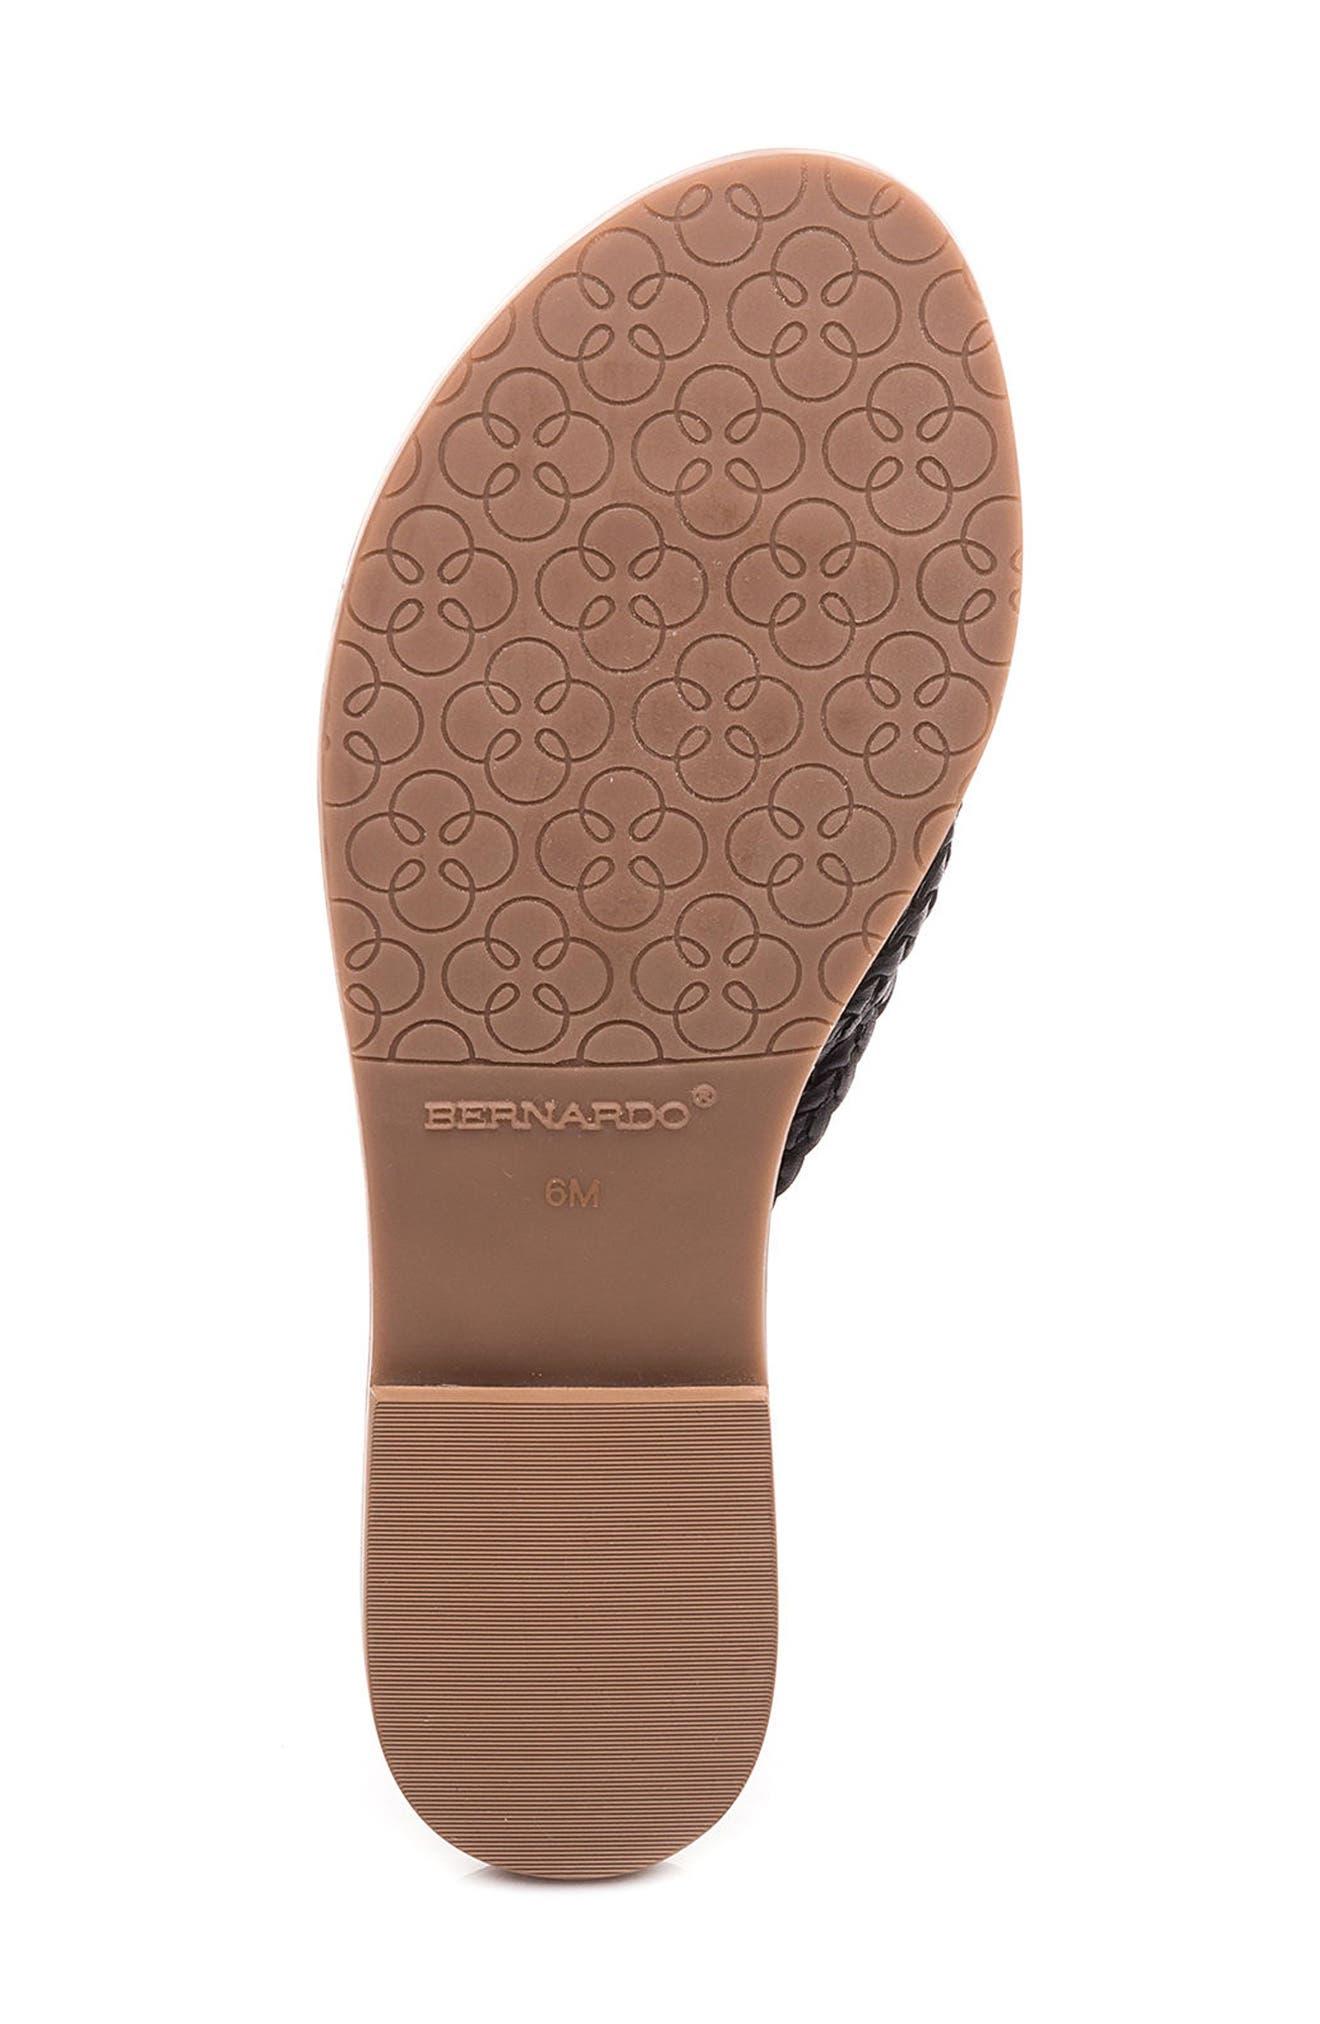 Bernardo Greta Braided Strap Sandal,                             Alternate thumbnail 6, color,                             Black Leather